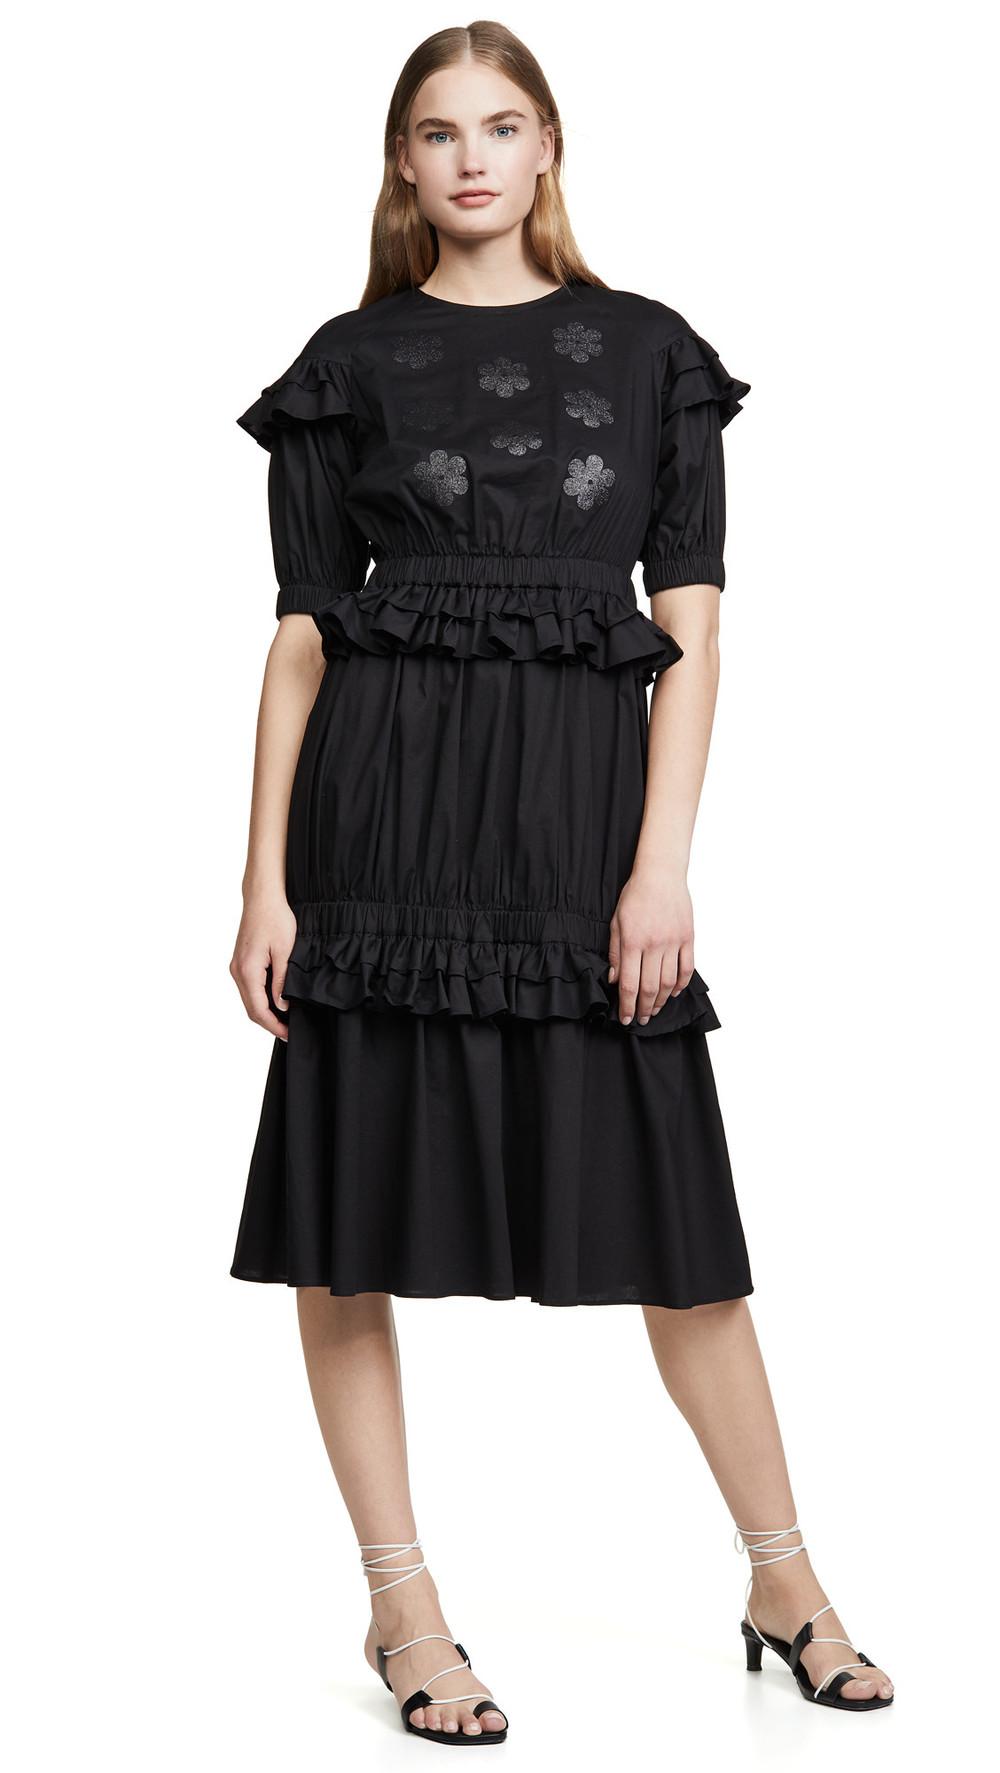 Paskal Short Sleeve Frilled Dress with Floral Appliques in black